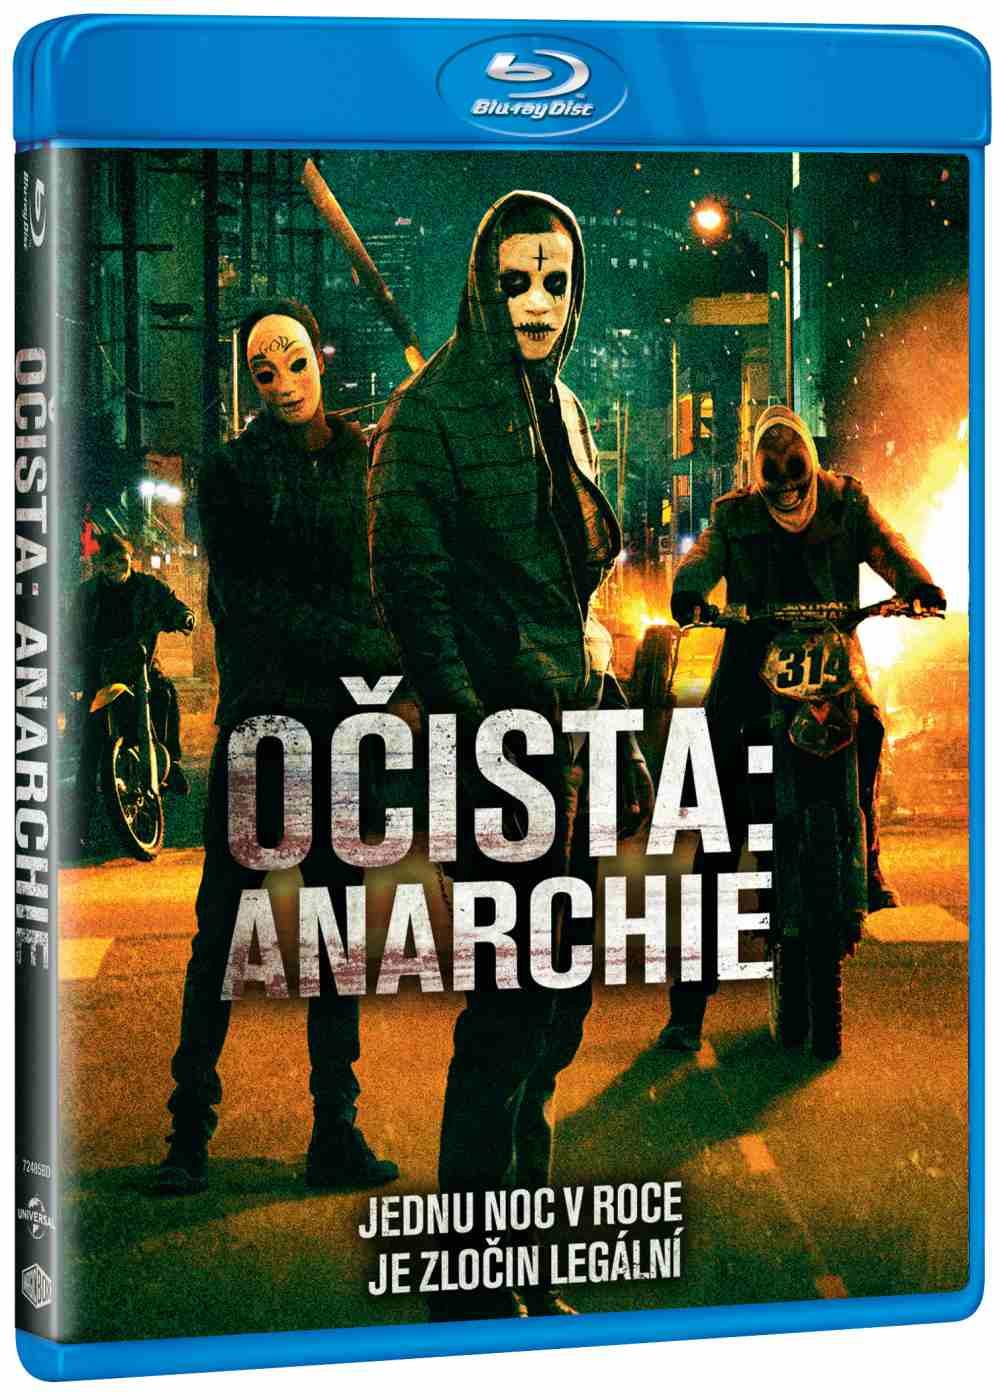 OČISTA: ANARCHIE - Blu-ray